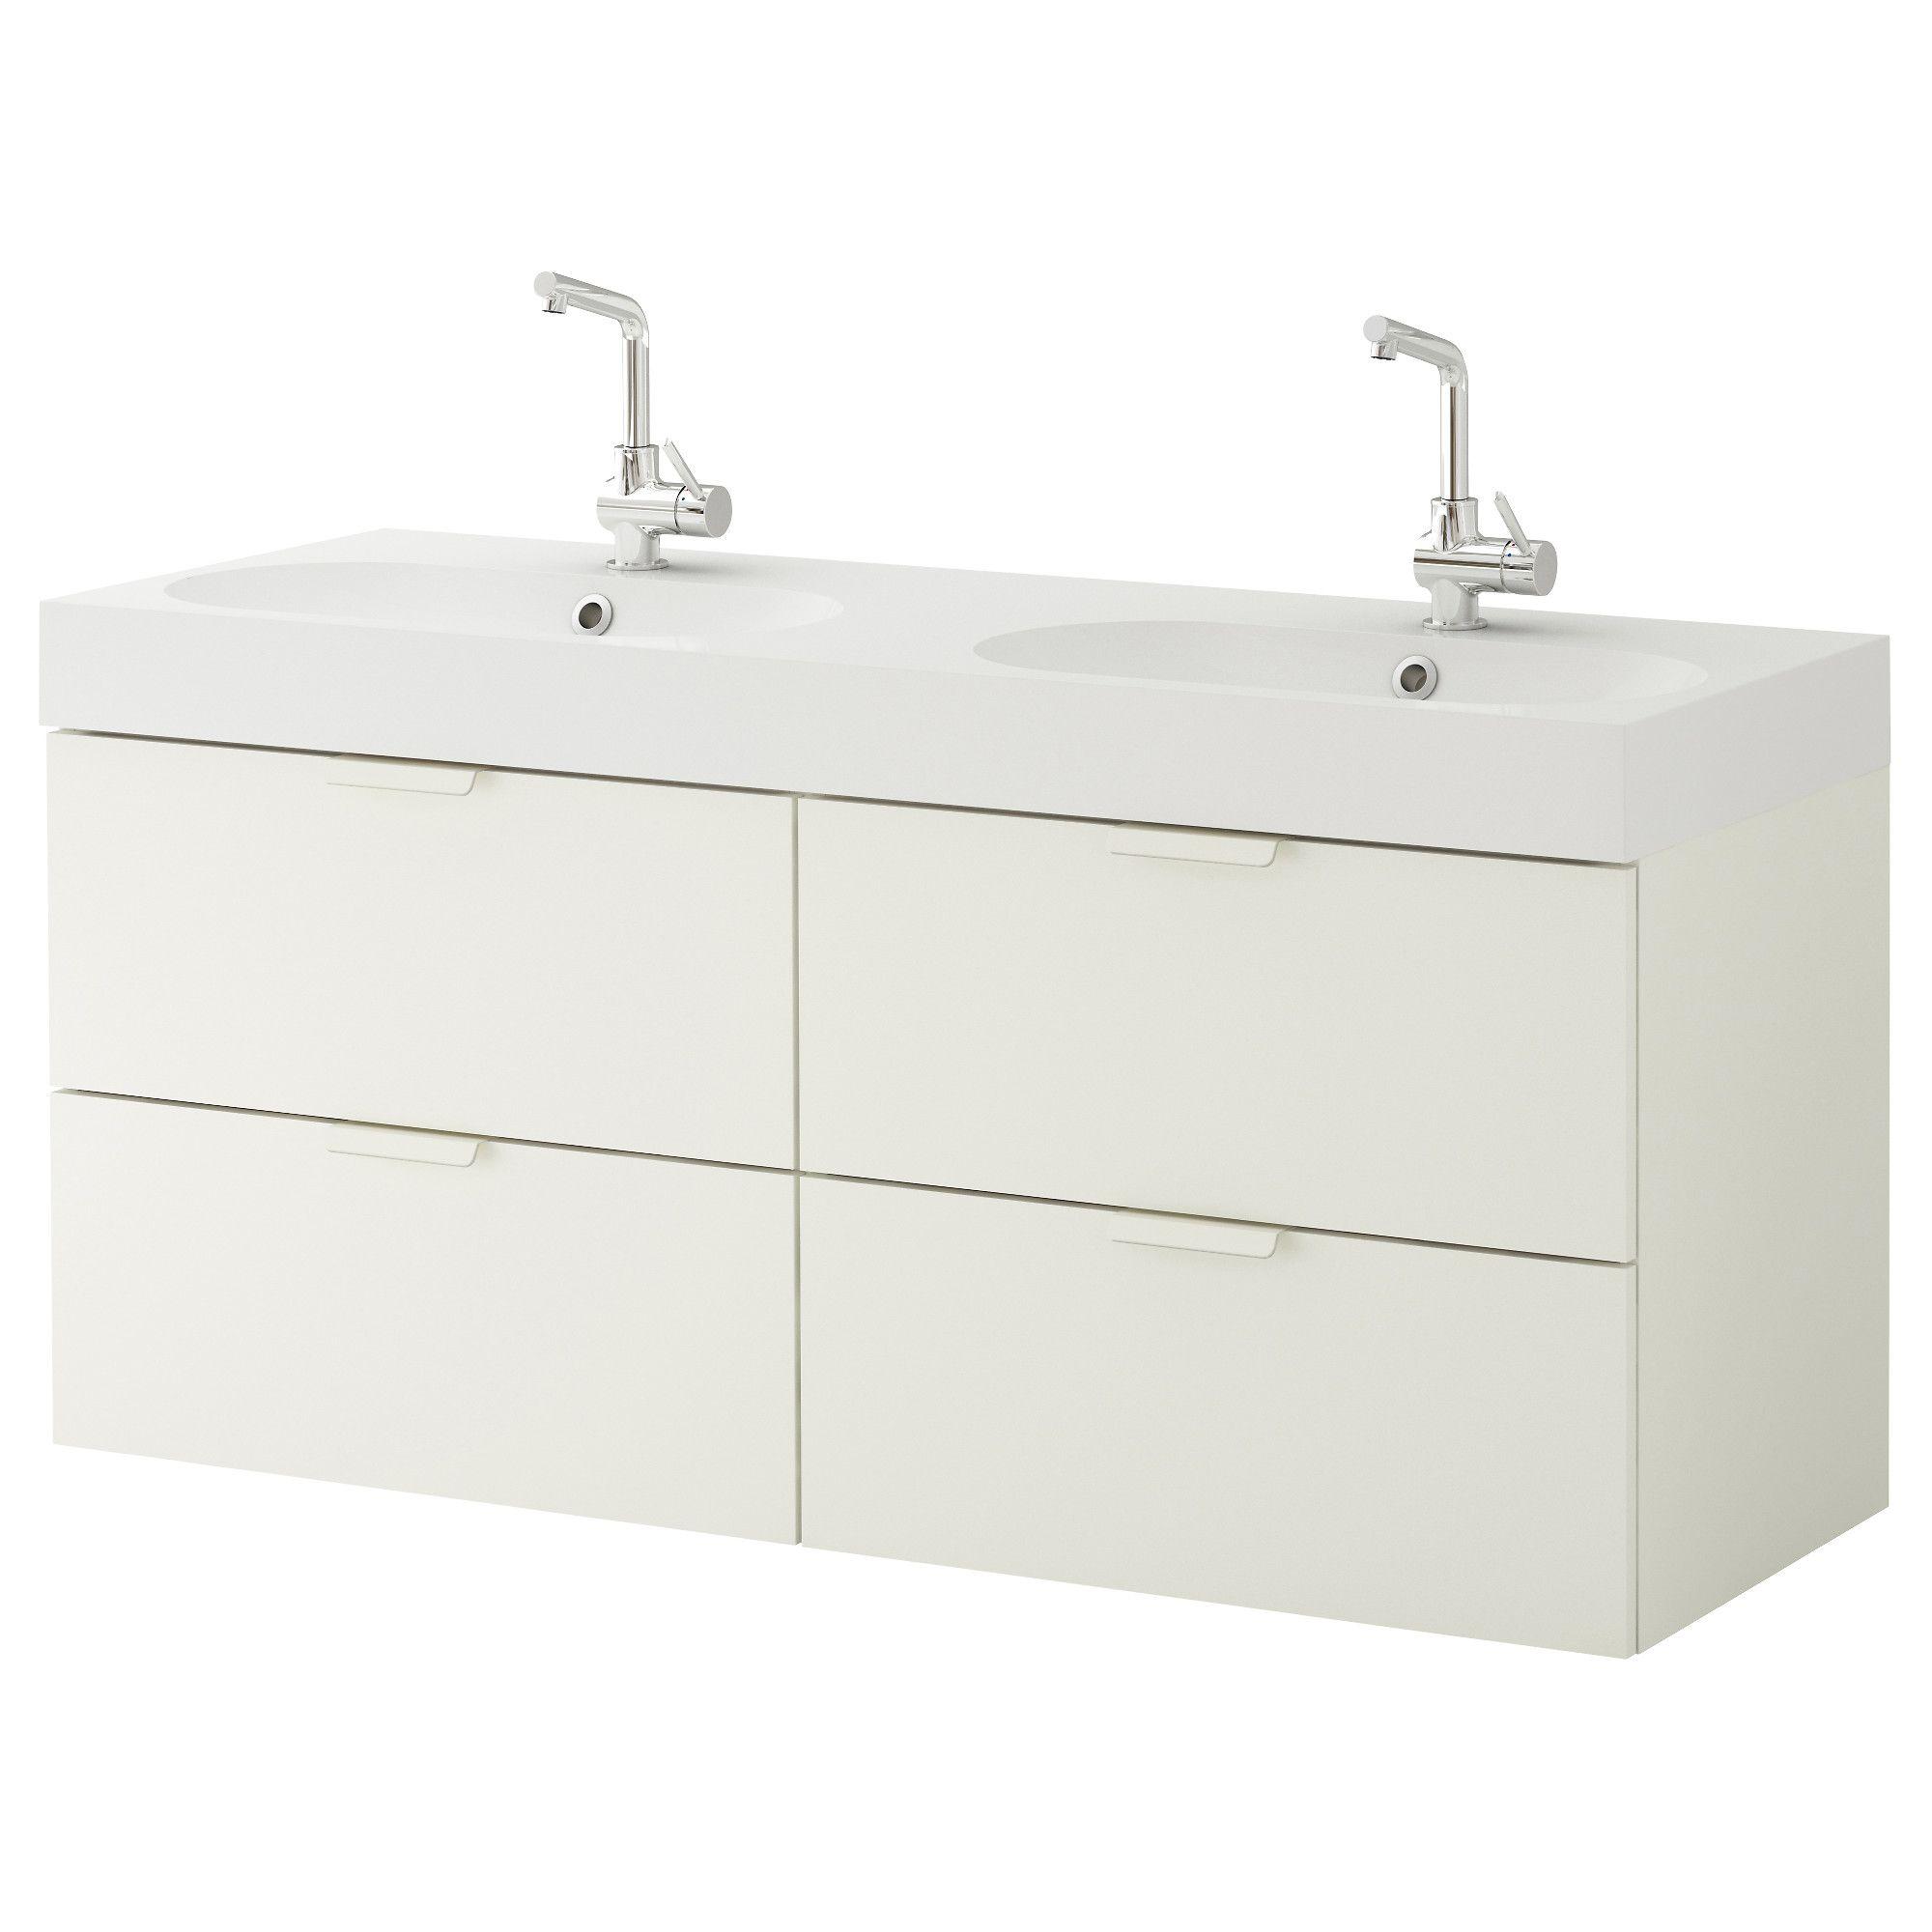 GODMORGON / BRÅVIKEN Sink cabinet with 4 drawers - white - IKEA ...